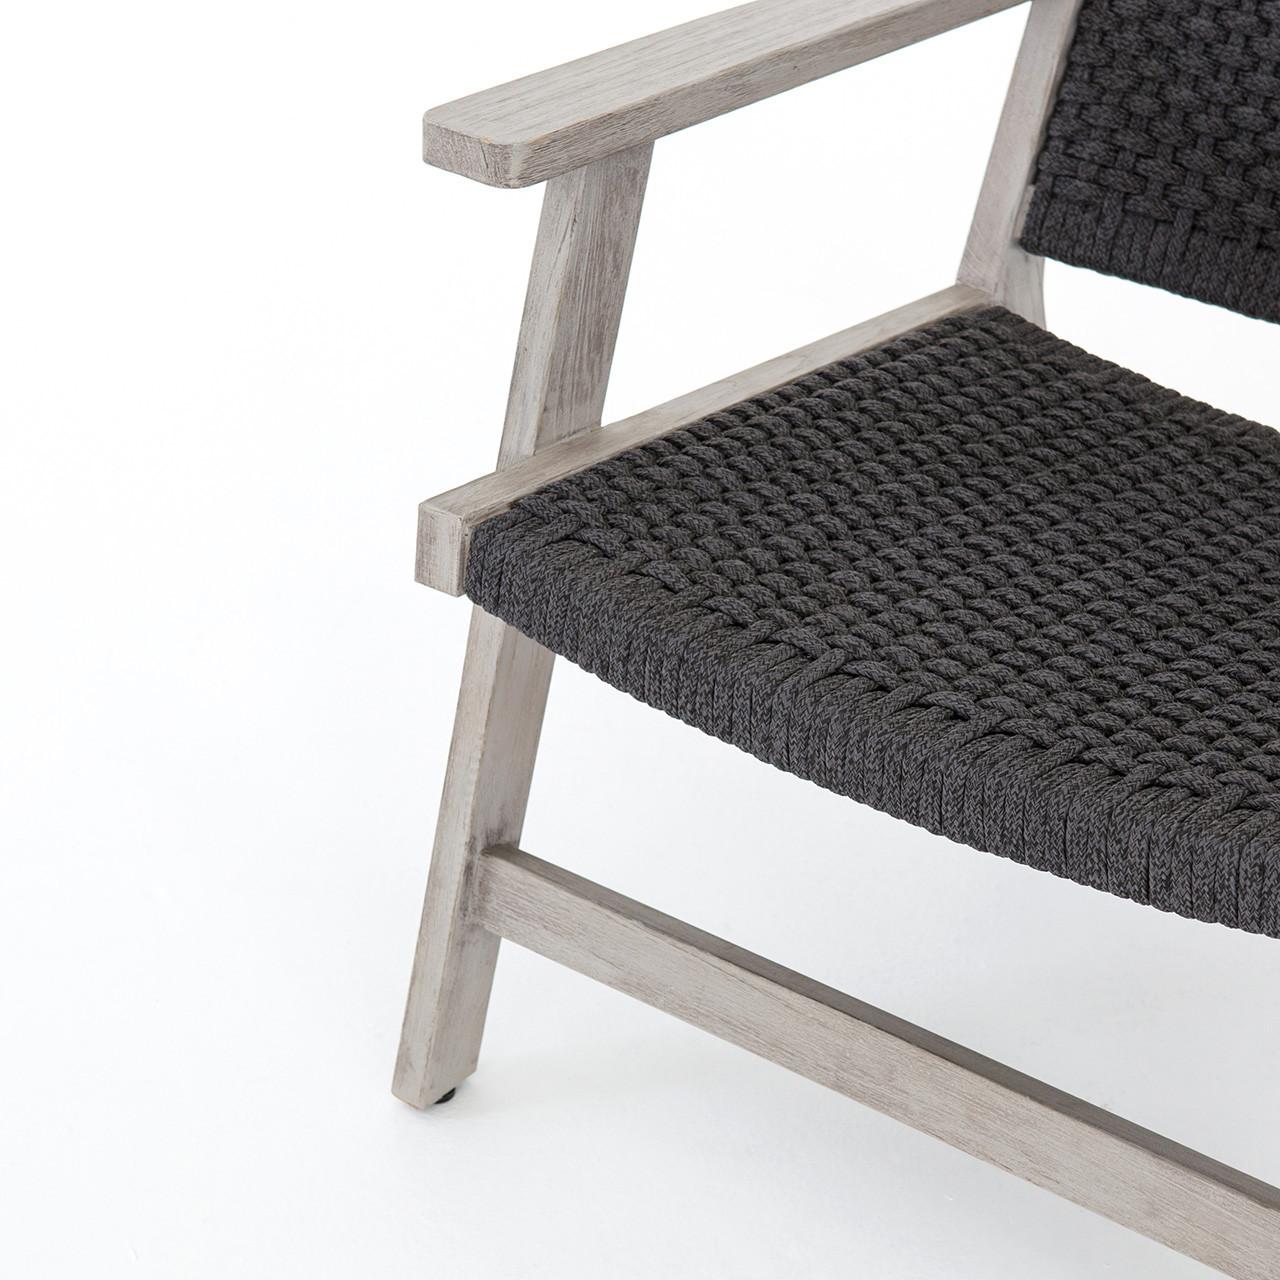 Teak Tamarack Outdoor Lounge Chair + Ottoman - Charcoal Grey